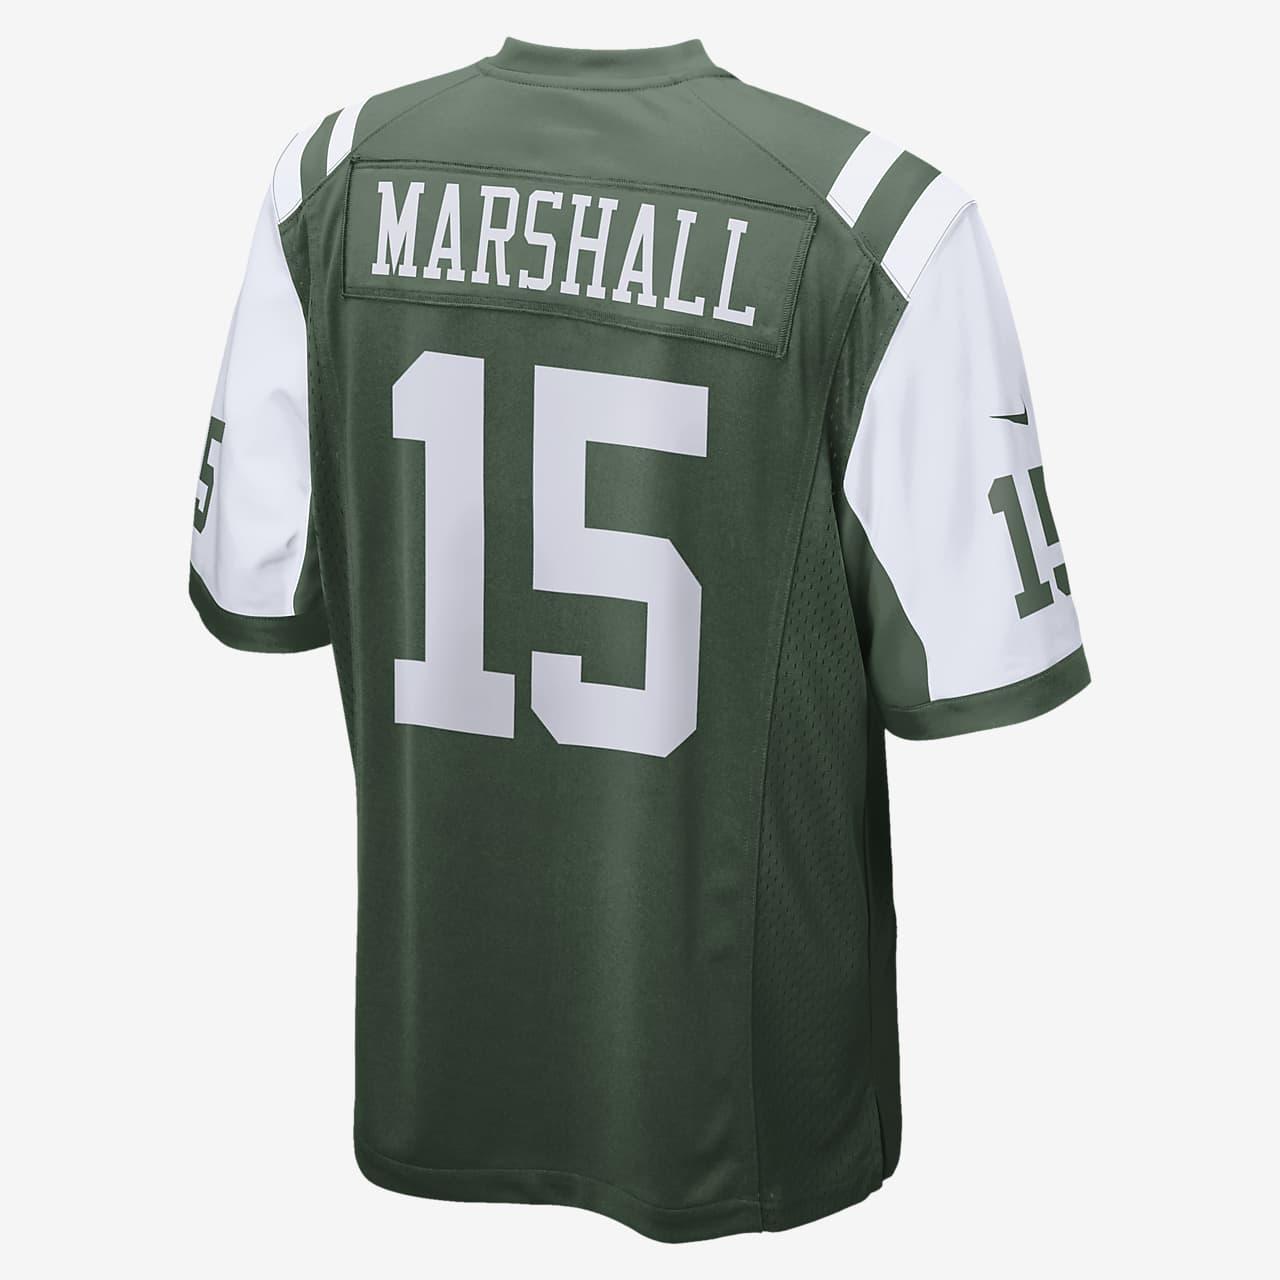 NFL New York Jets (Brandon Marshall) Men's American Football Home Game Jersey